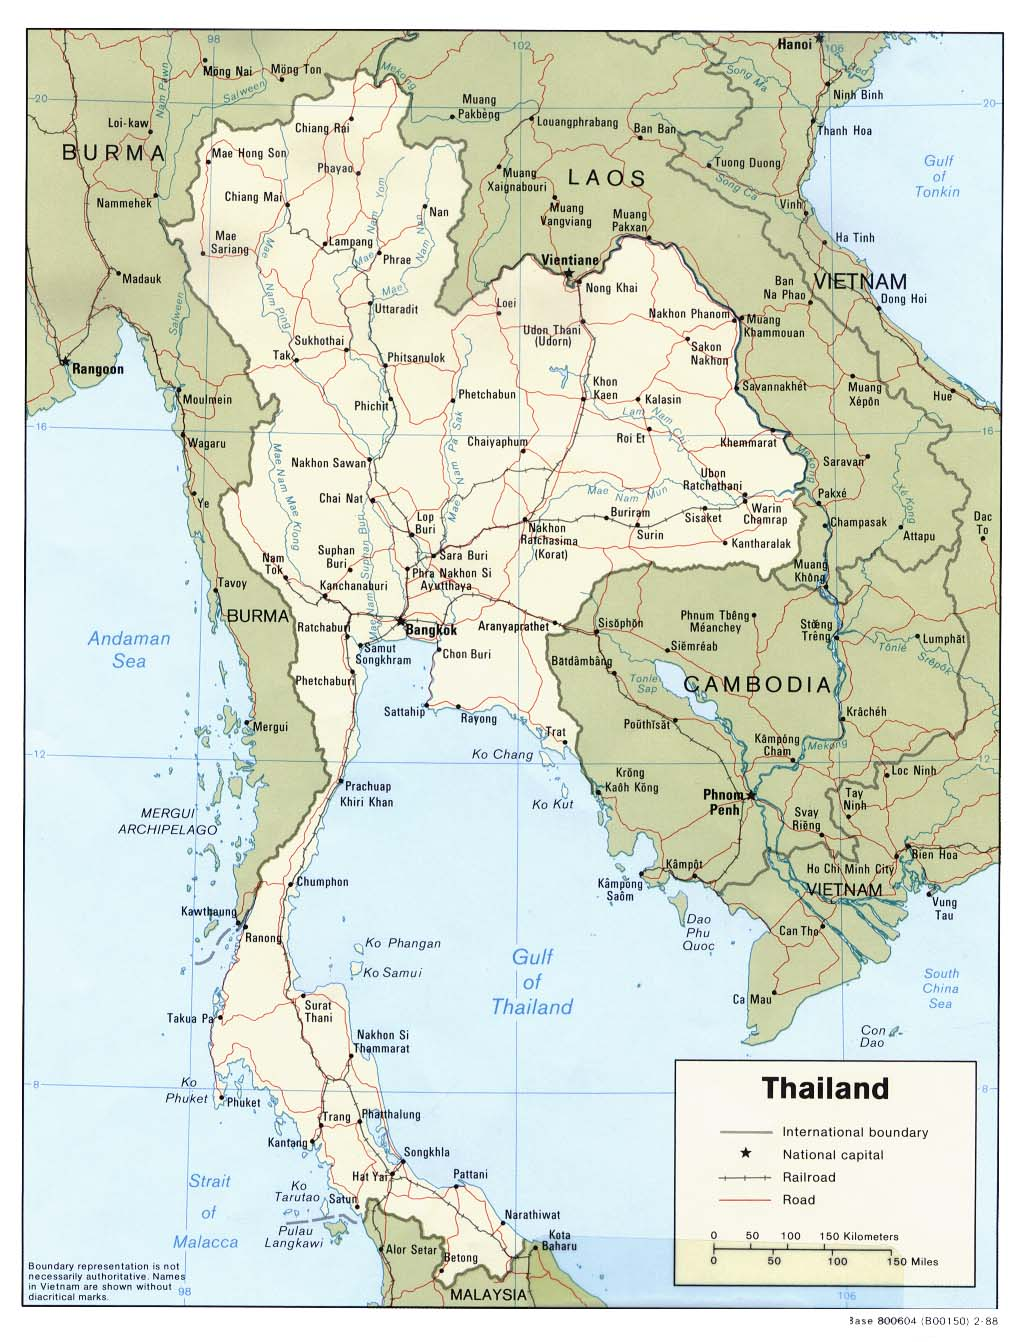 Mapa Politico de Tailandia